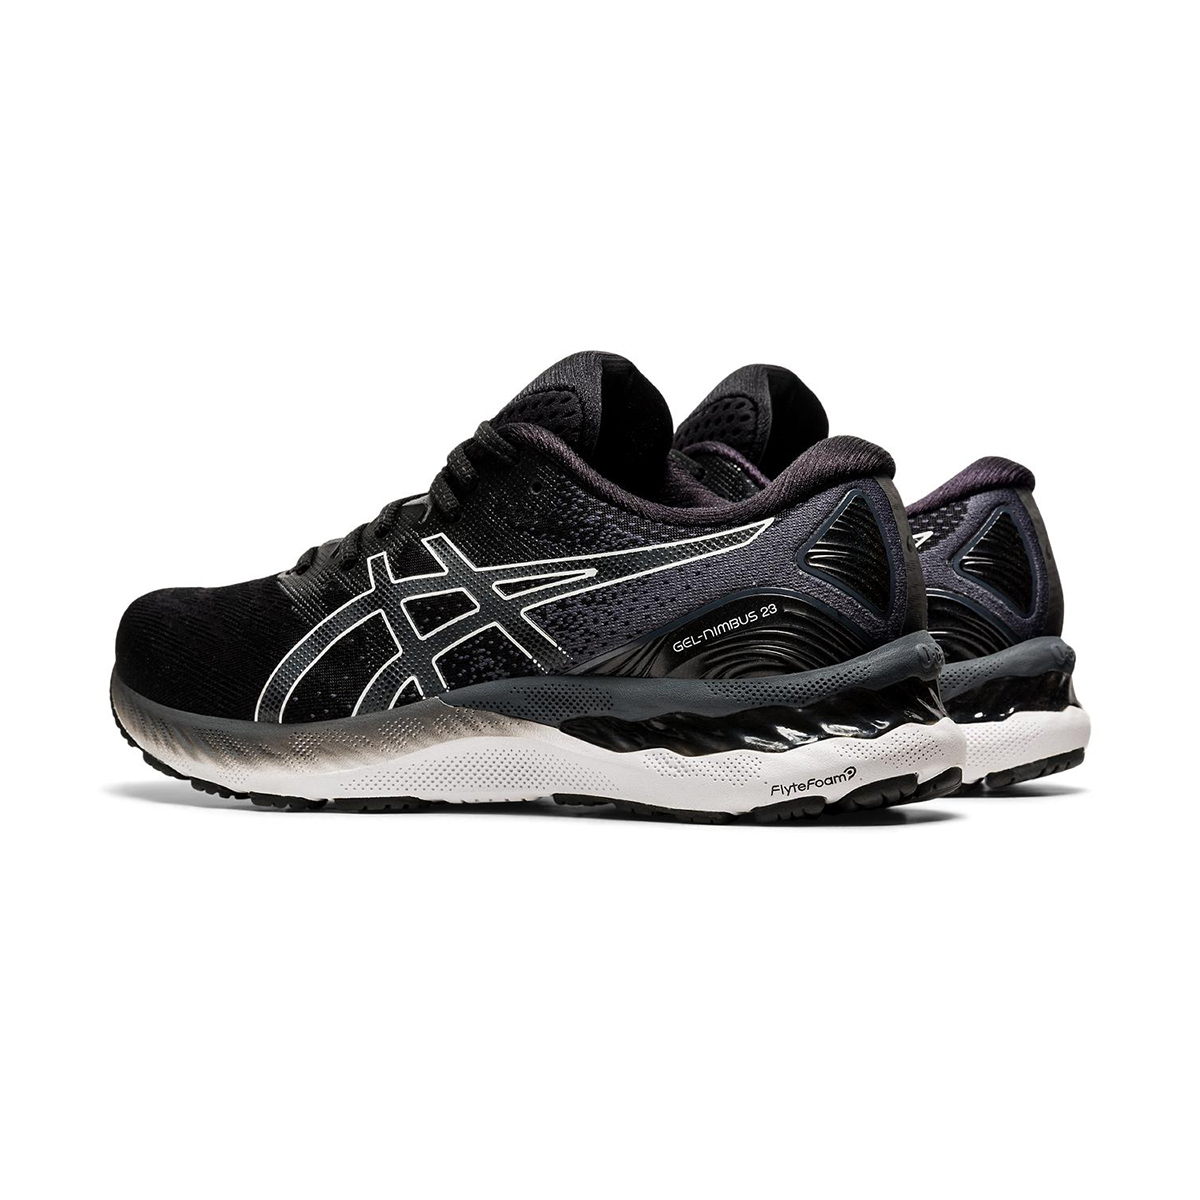 Men's Asics GEL-Nimbus 23 Running Shoe - Color: Black/White - Size: 7 - Width: Regular, Black/White, large, image 4